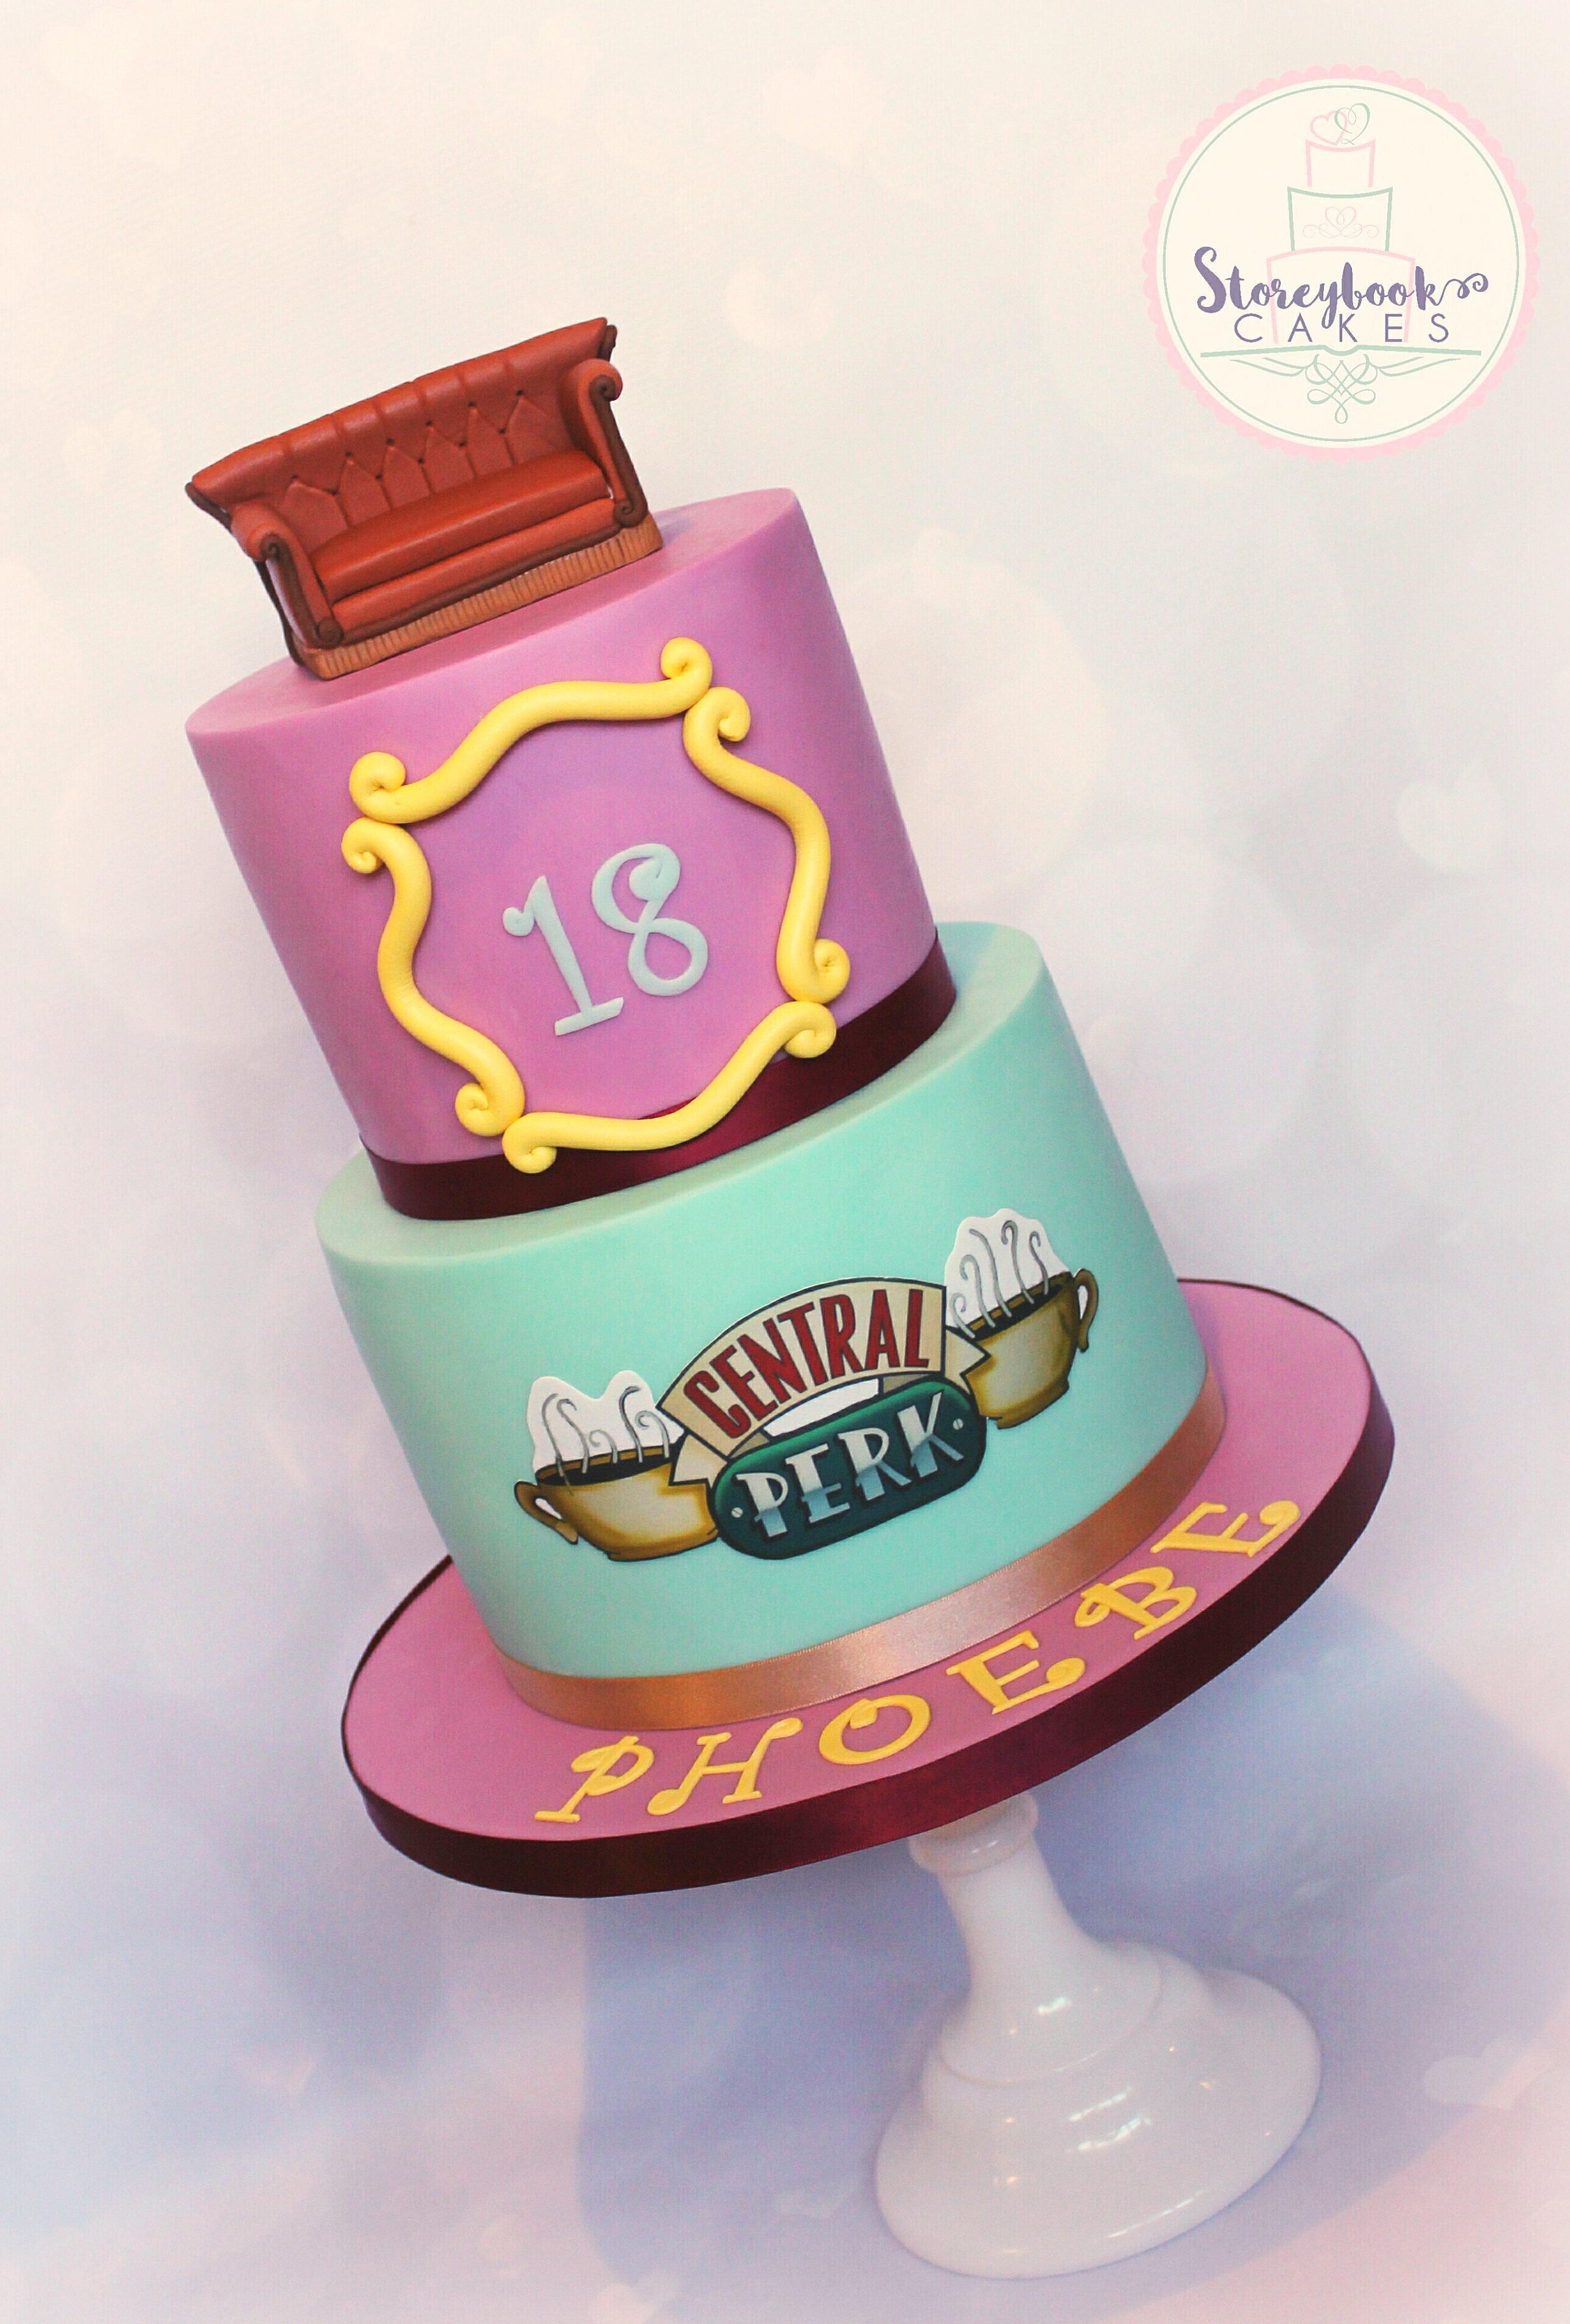 Cake Book Co Uk